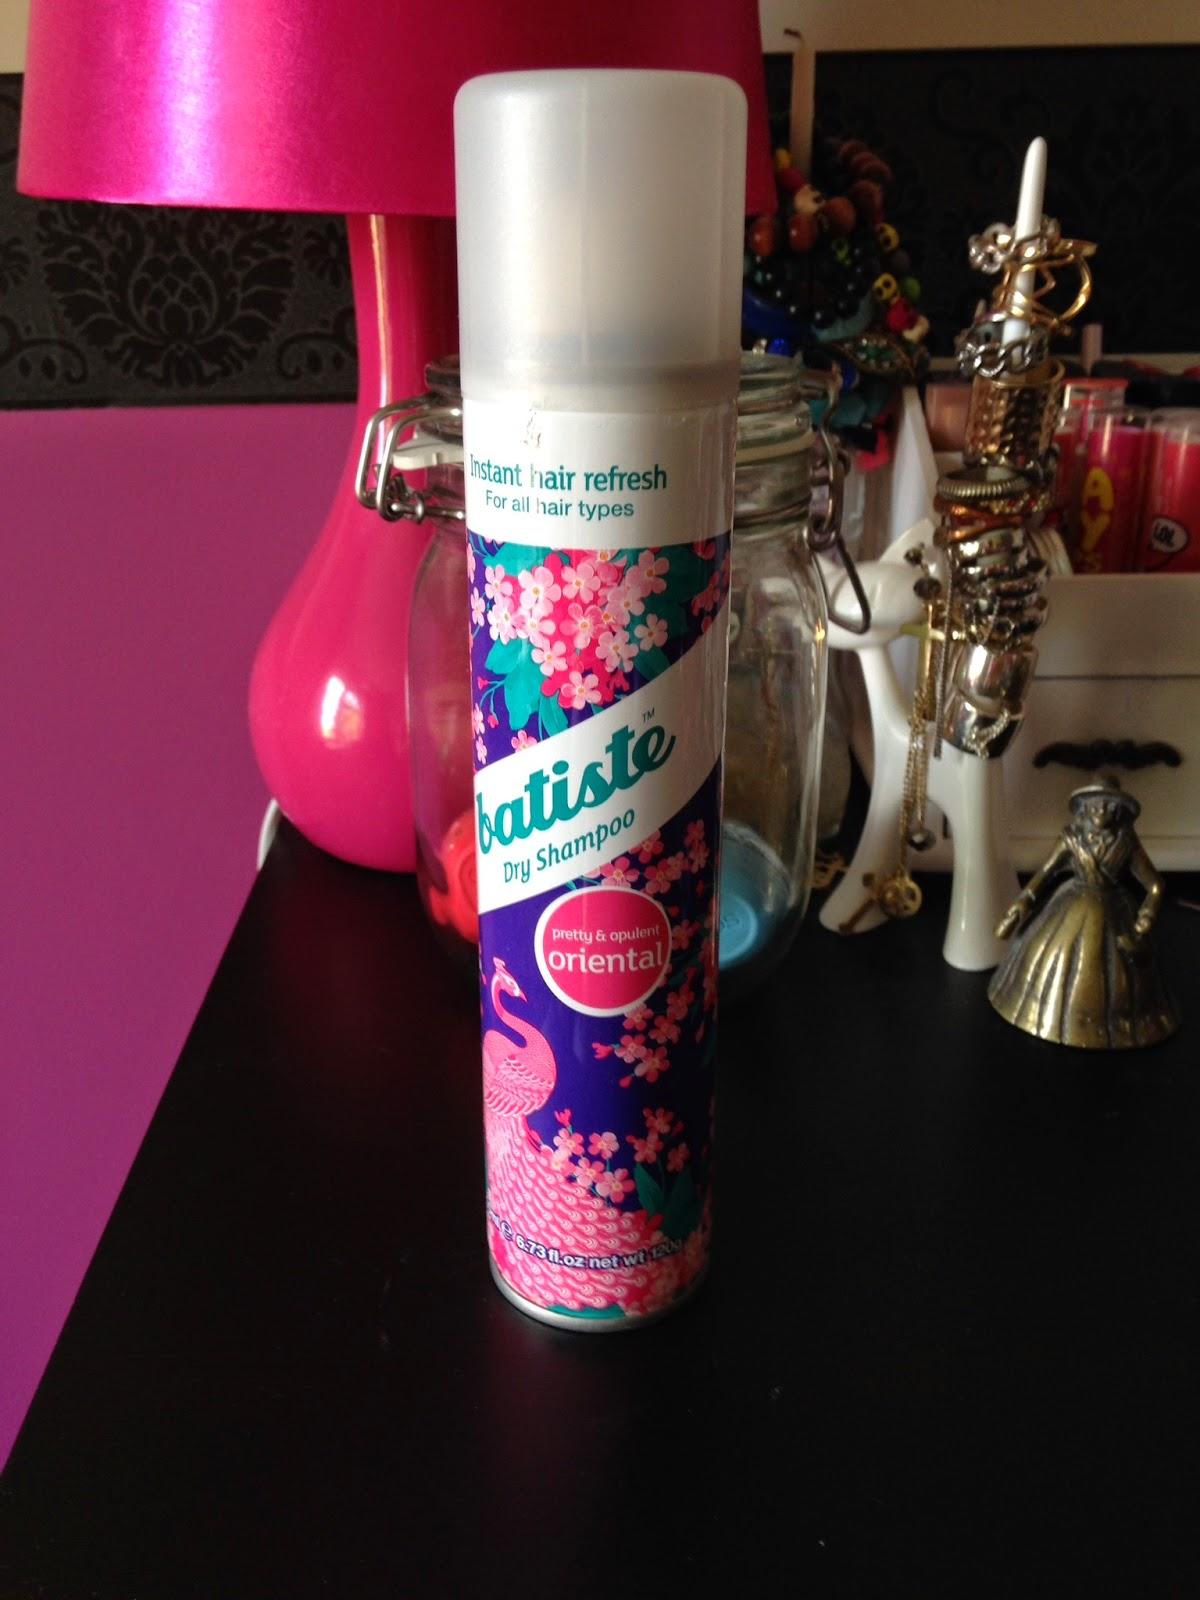 Batiste Dry Shampoo in Oriental